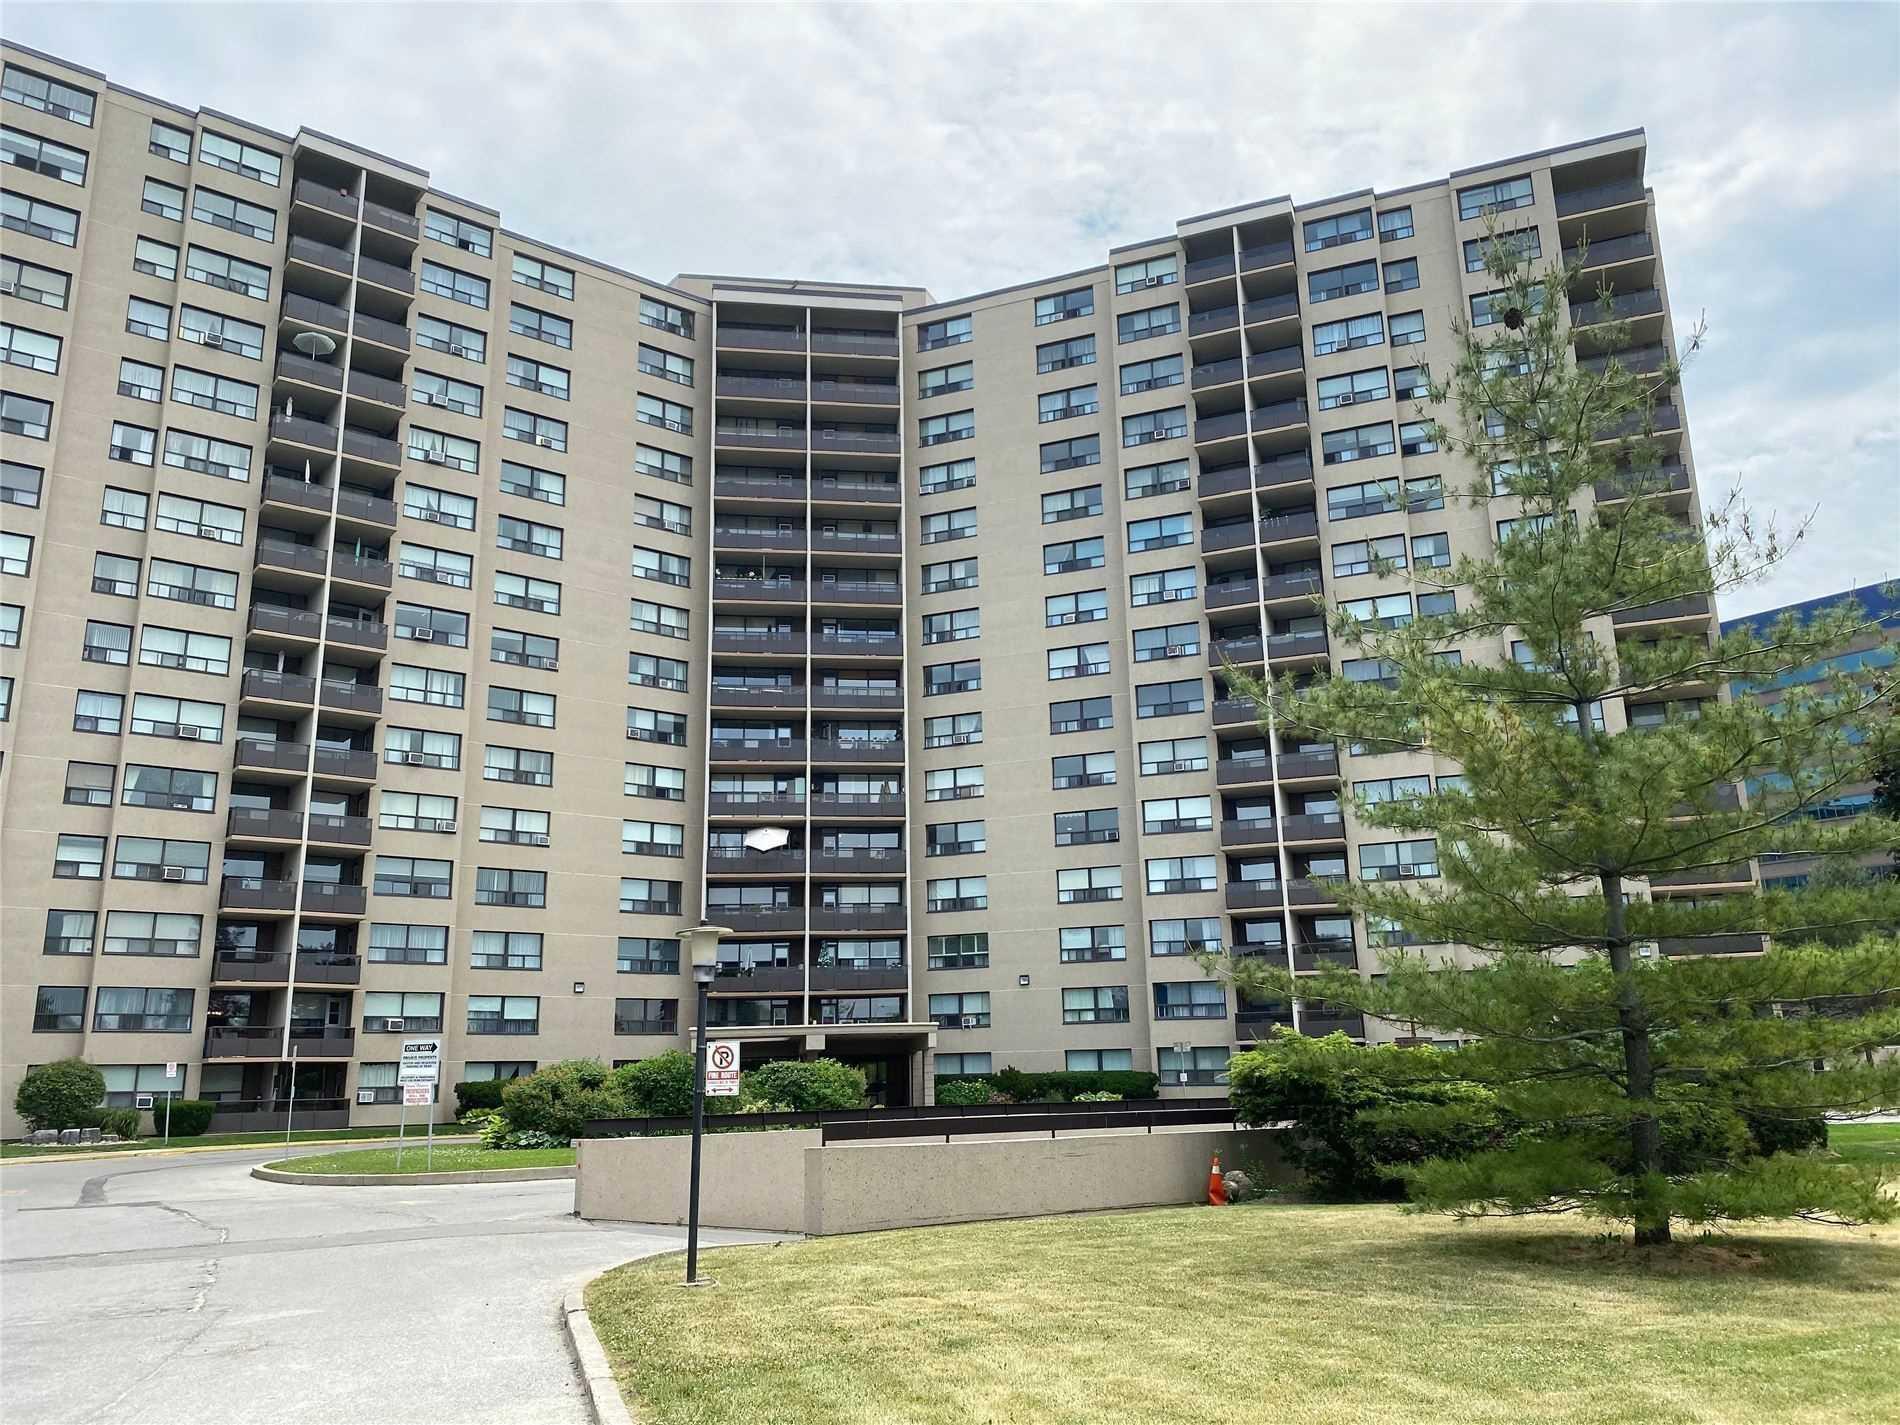 1505 - 451 The West Mall, Toronto, M9C 1G1